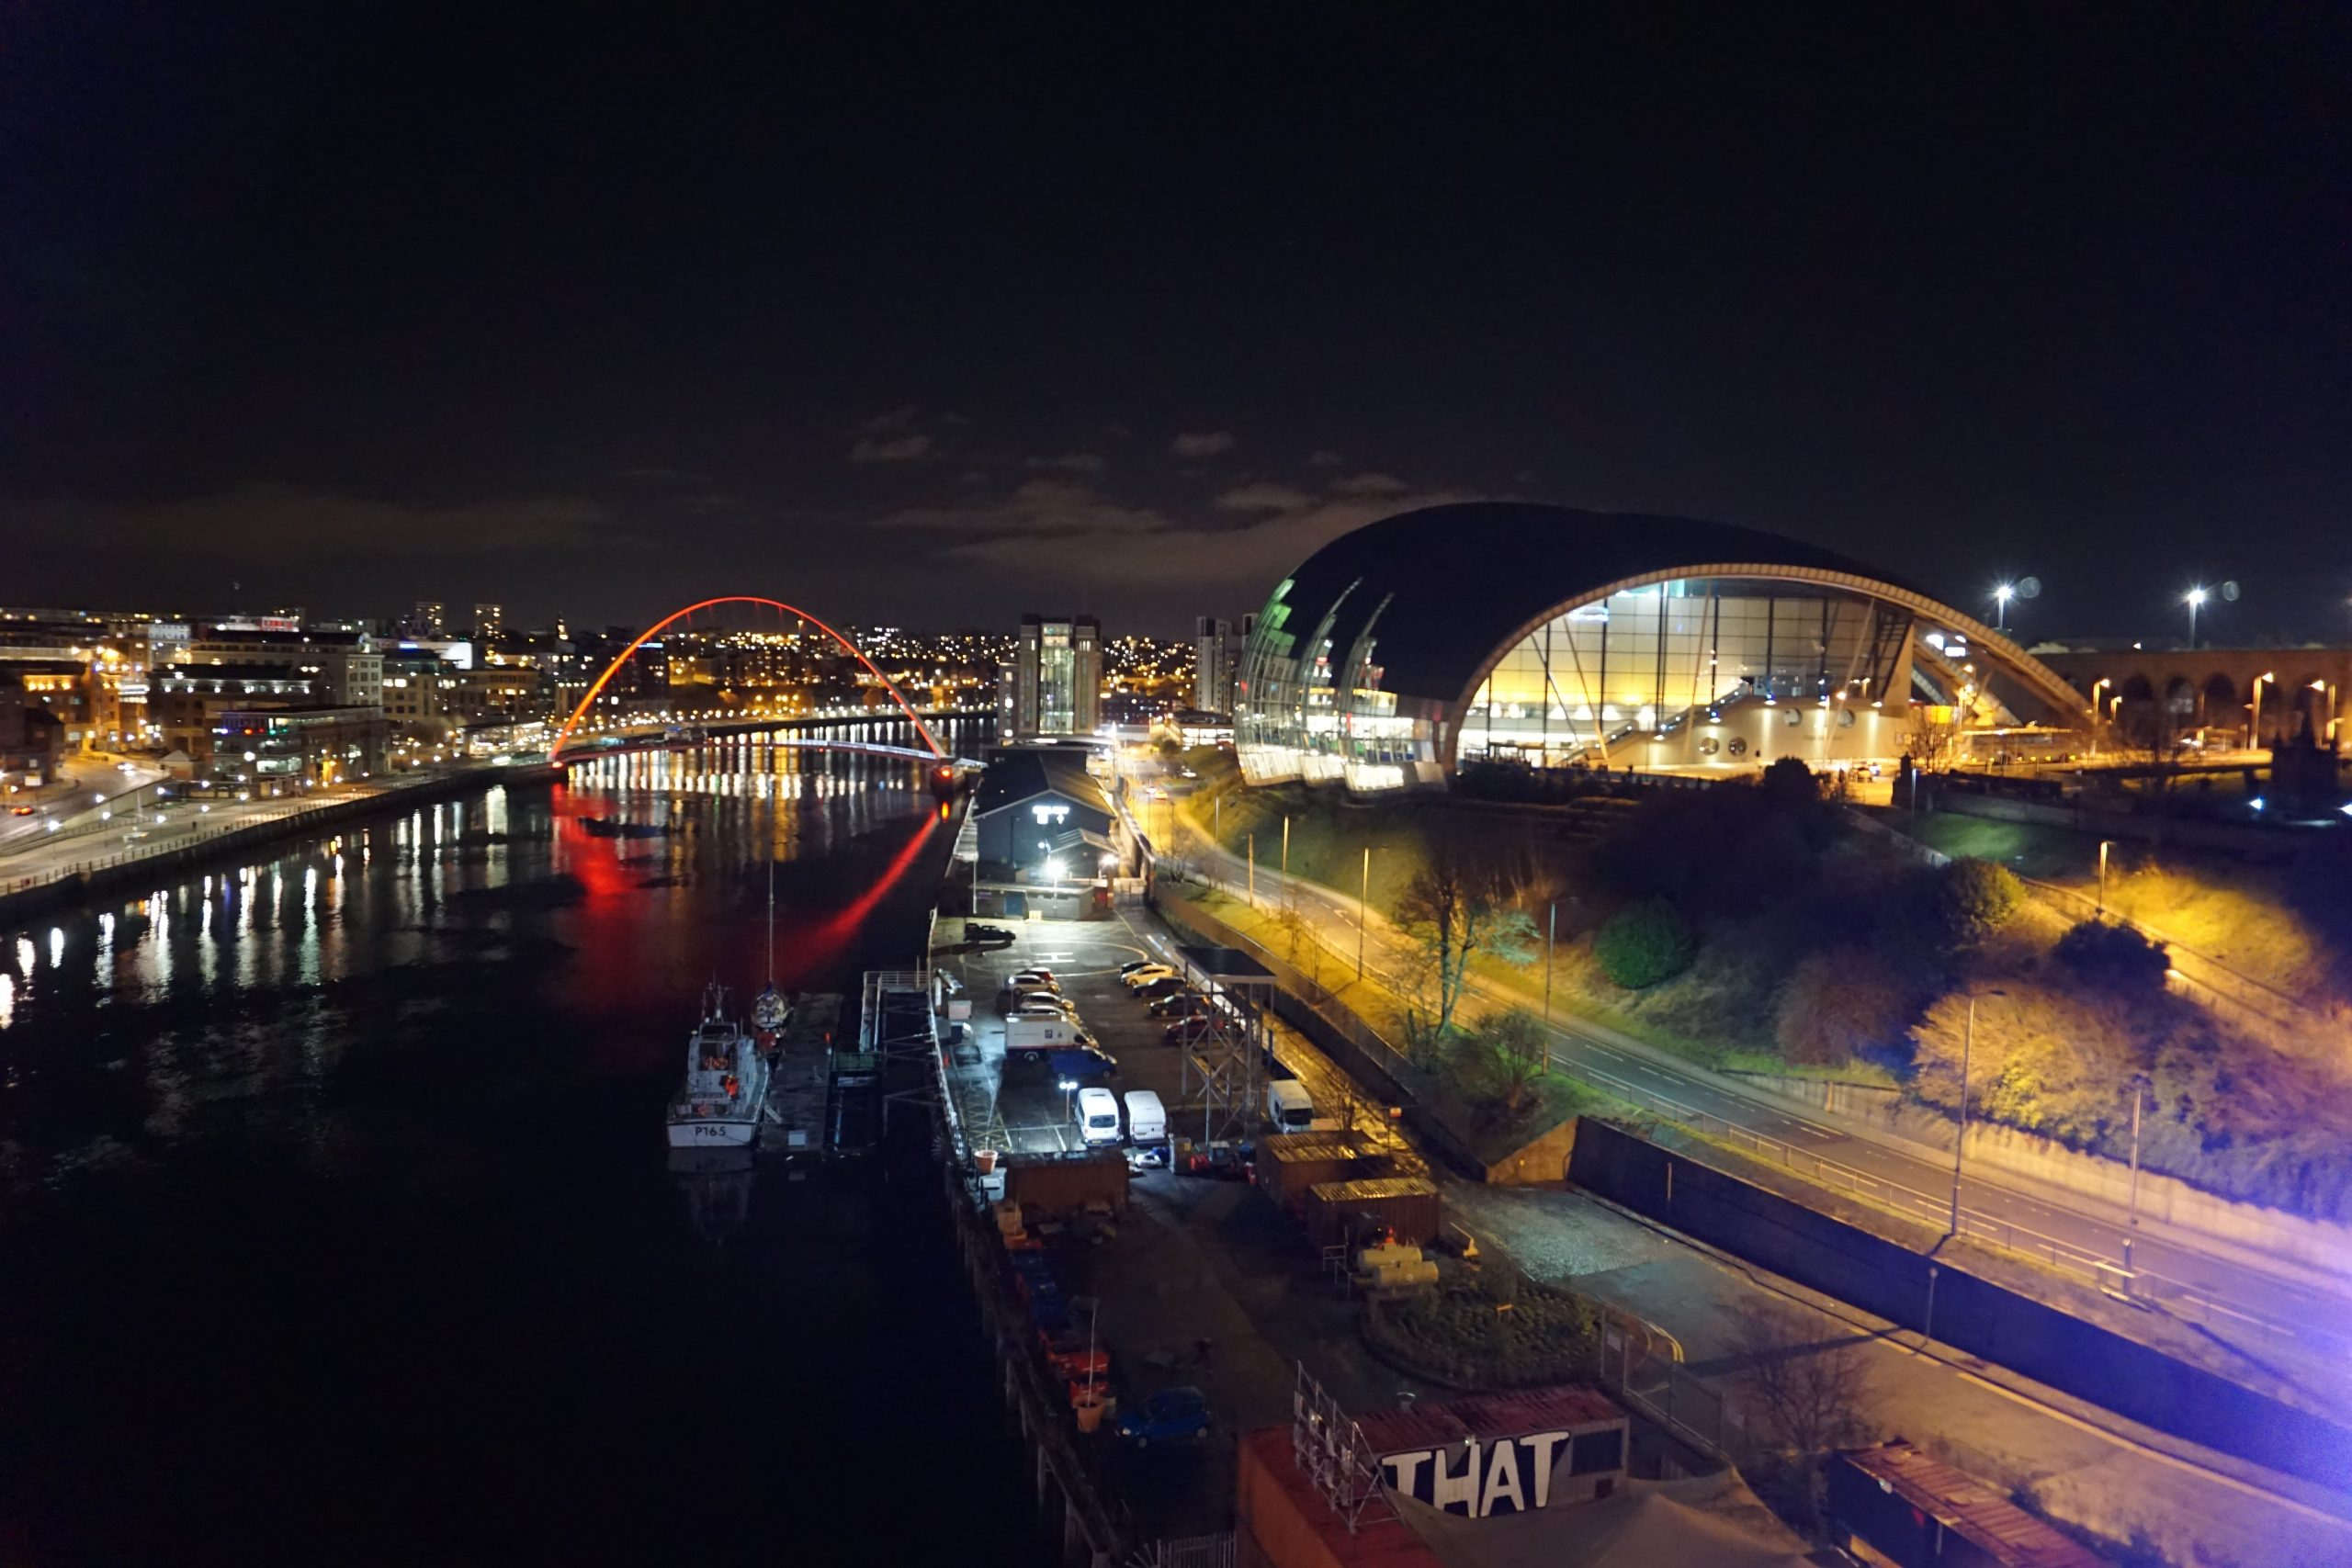 View of River Tyne, Millennium bridge and Gateshead Sage from Tyne Bridge in Newcastle at night.